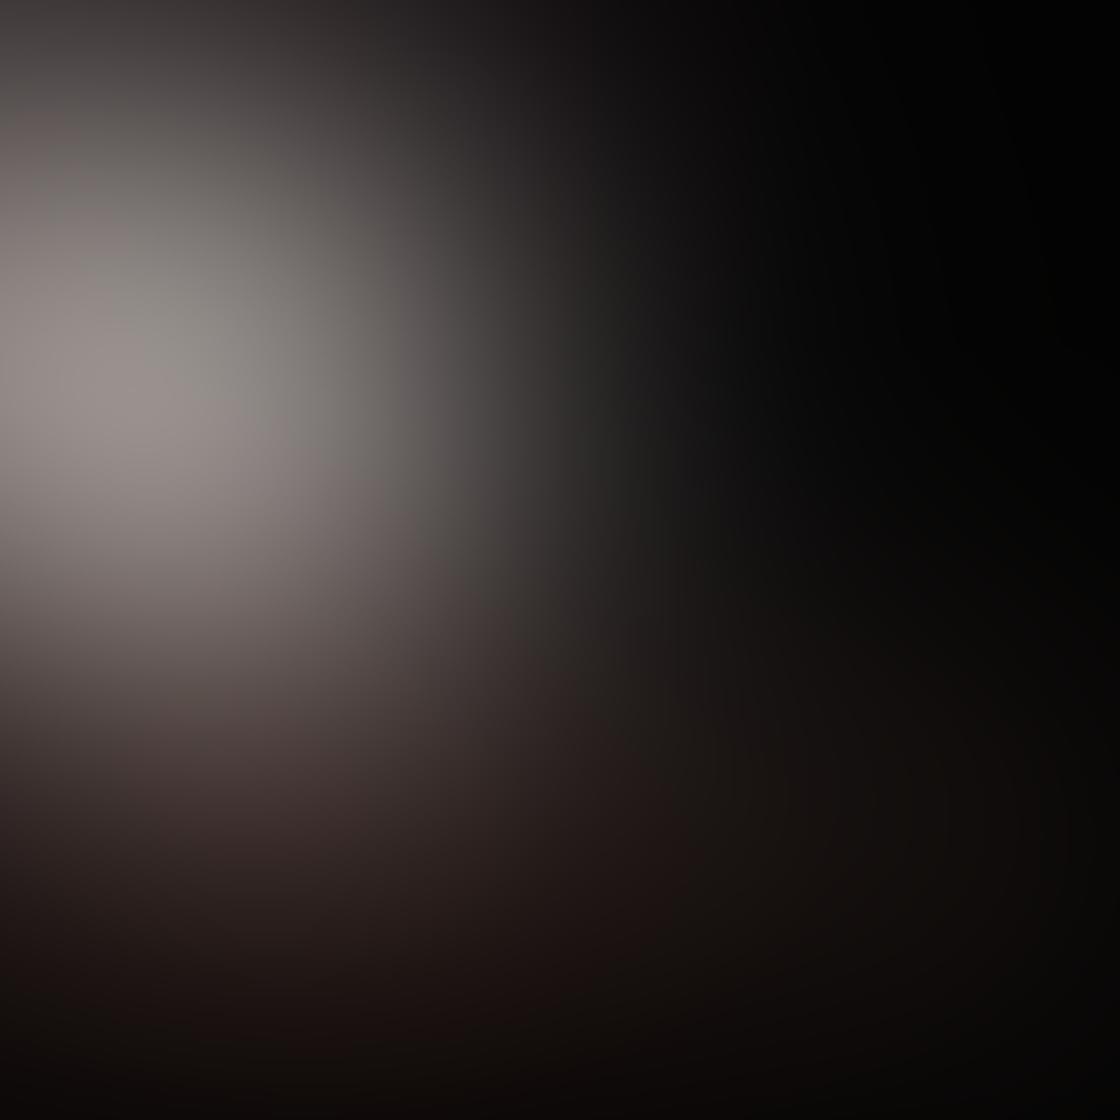 iPhone Photography Light 22